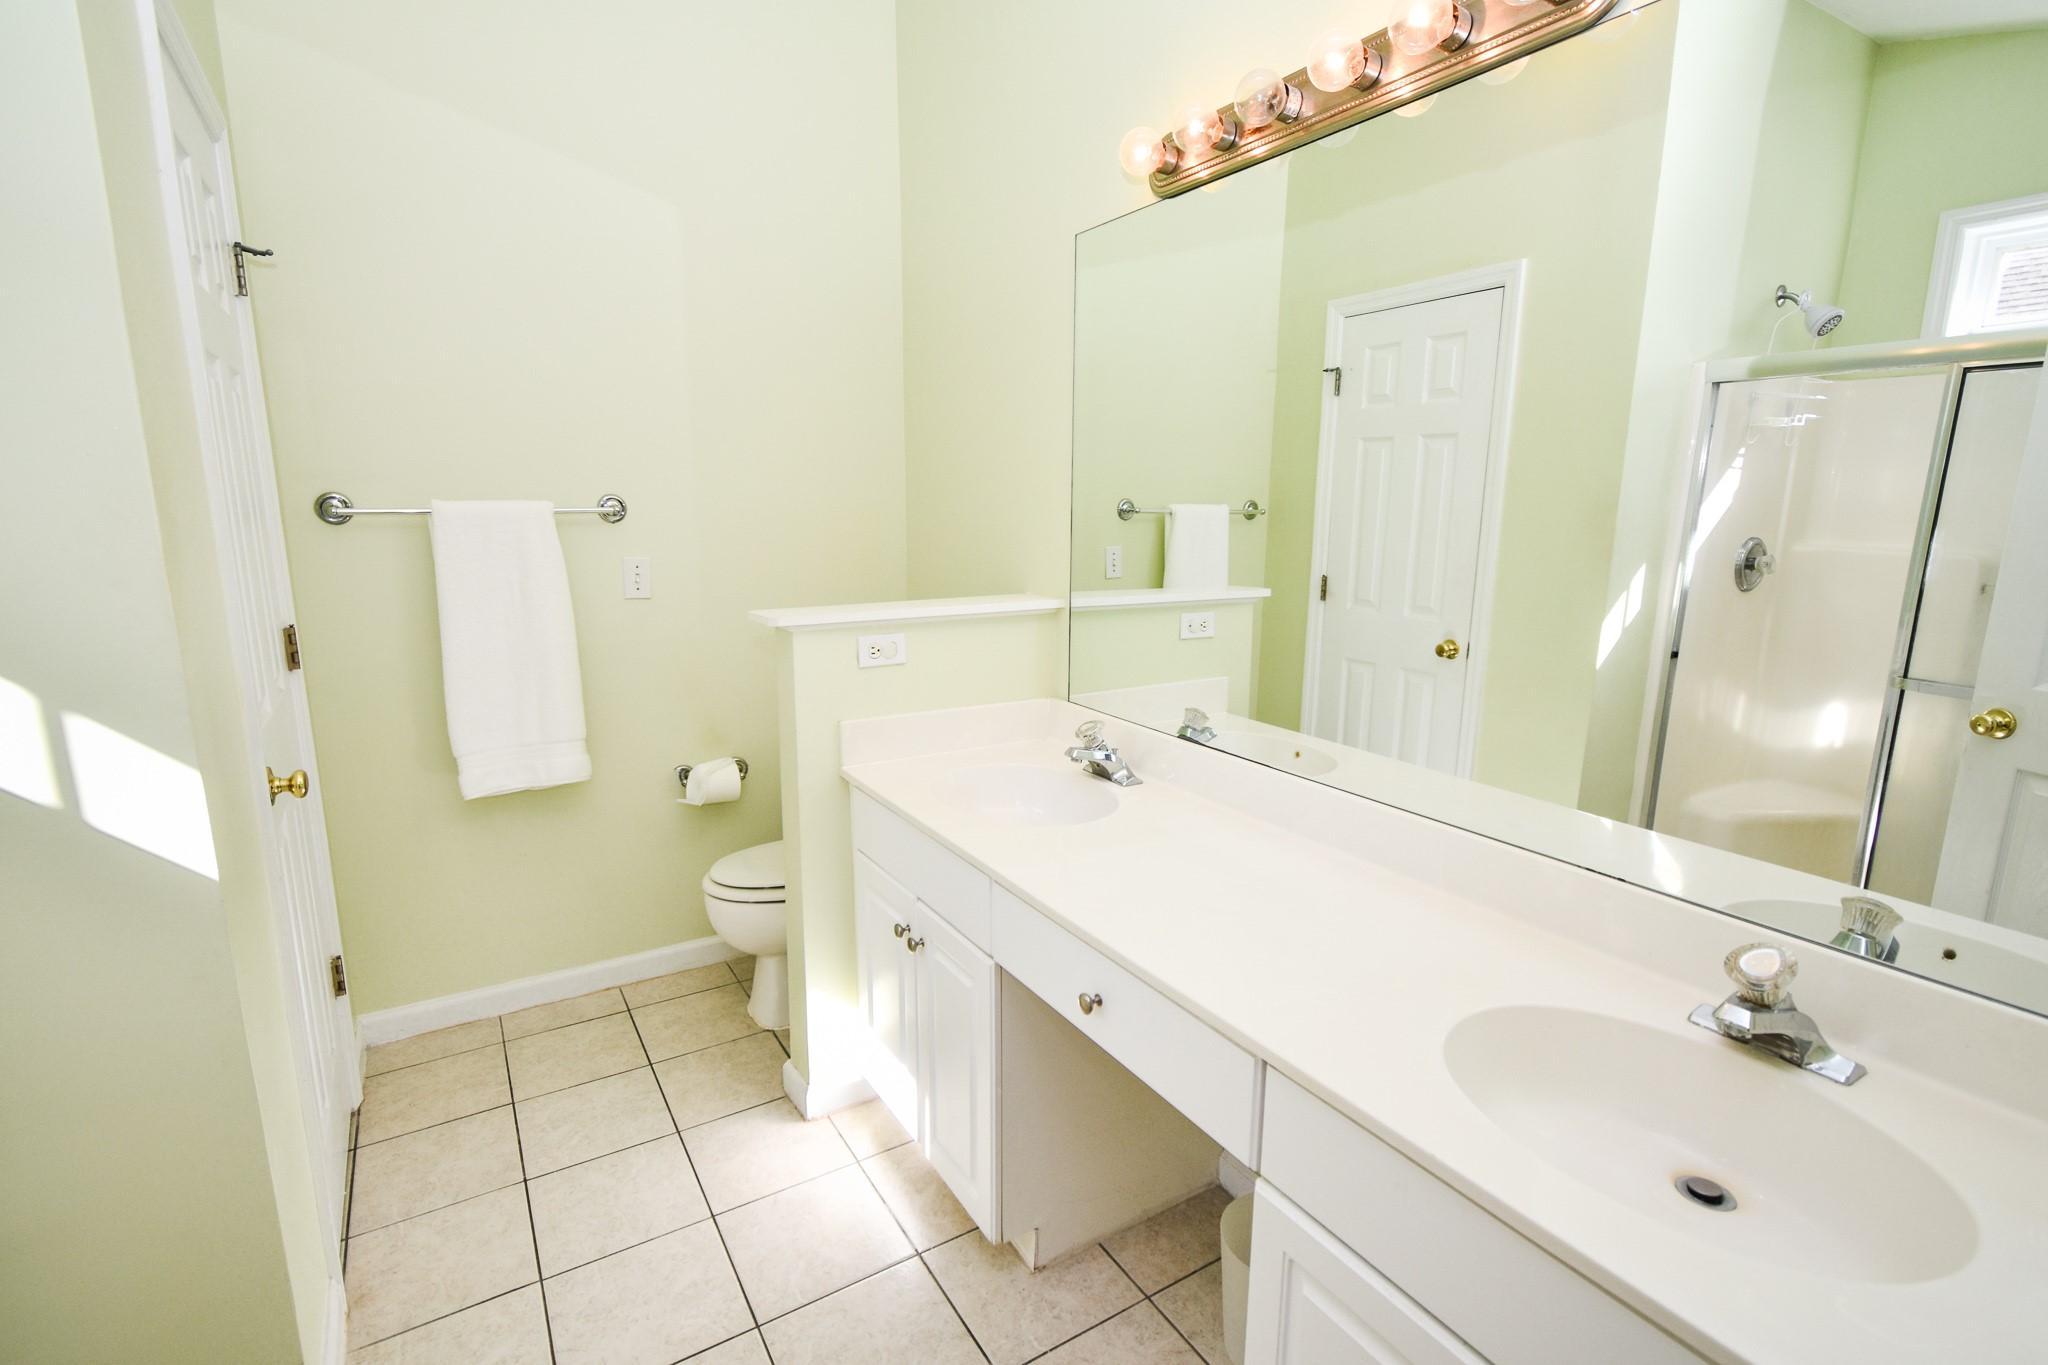 Park West Homes For Sale - 1444 Wellesley, Mount Pleasant, SC - 18